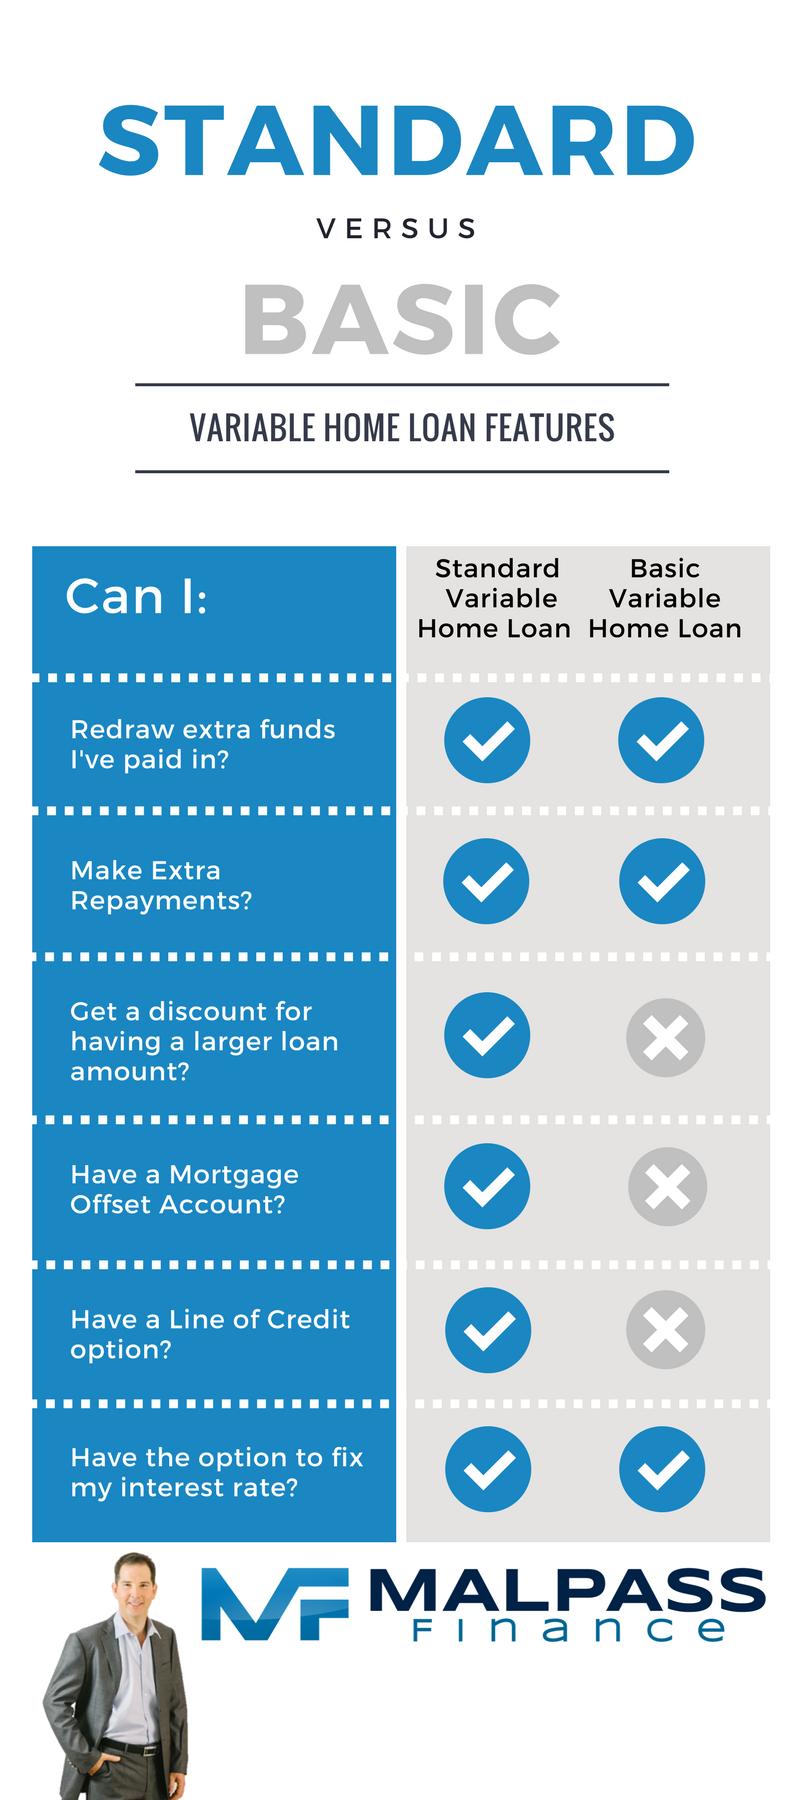 Refinancing With Poor Credit